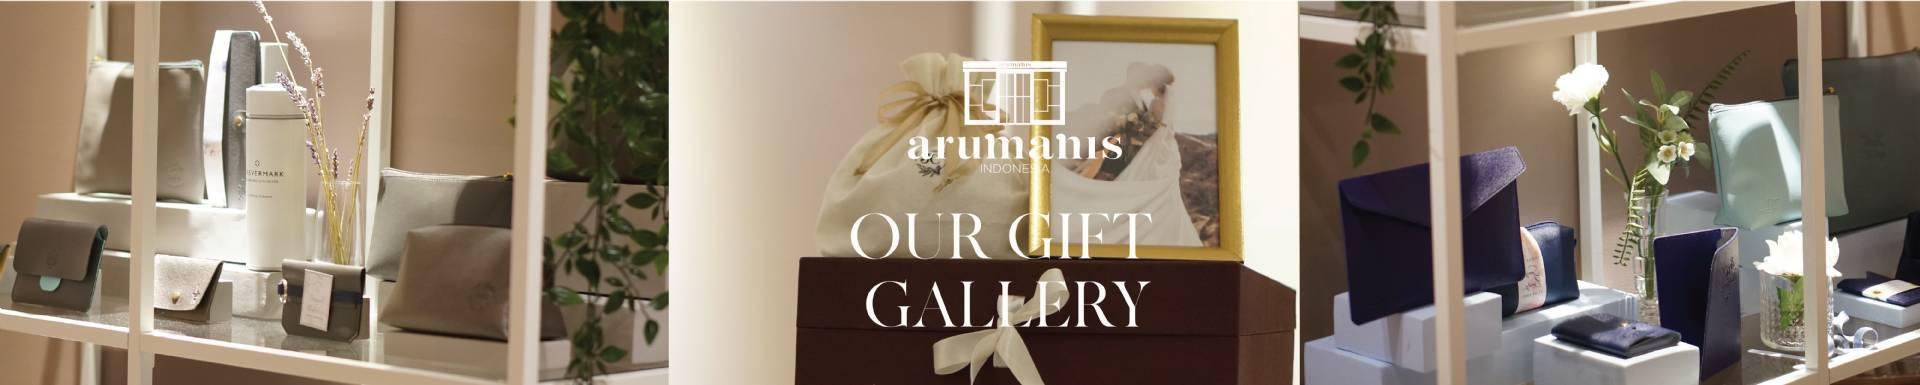 Arumanis Gift